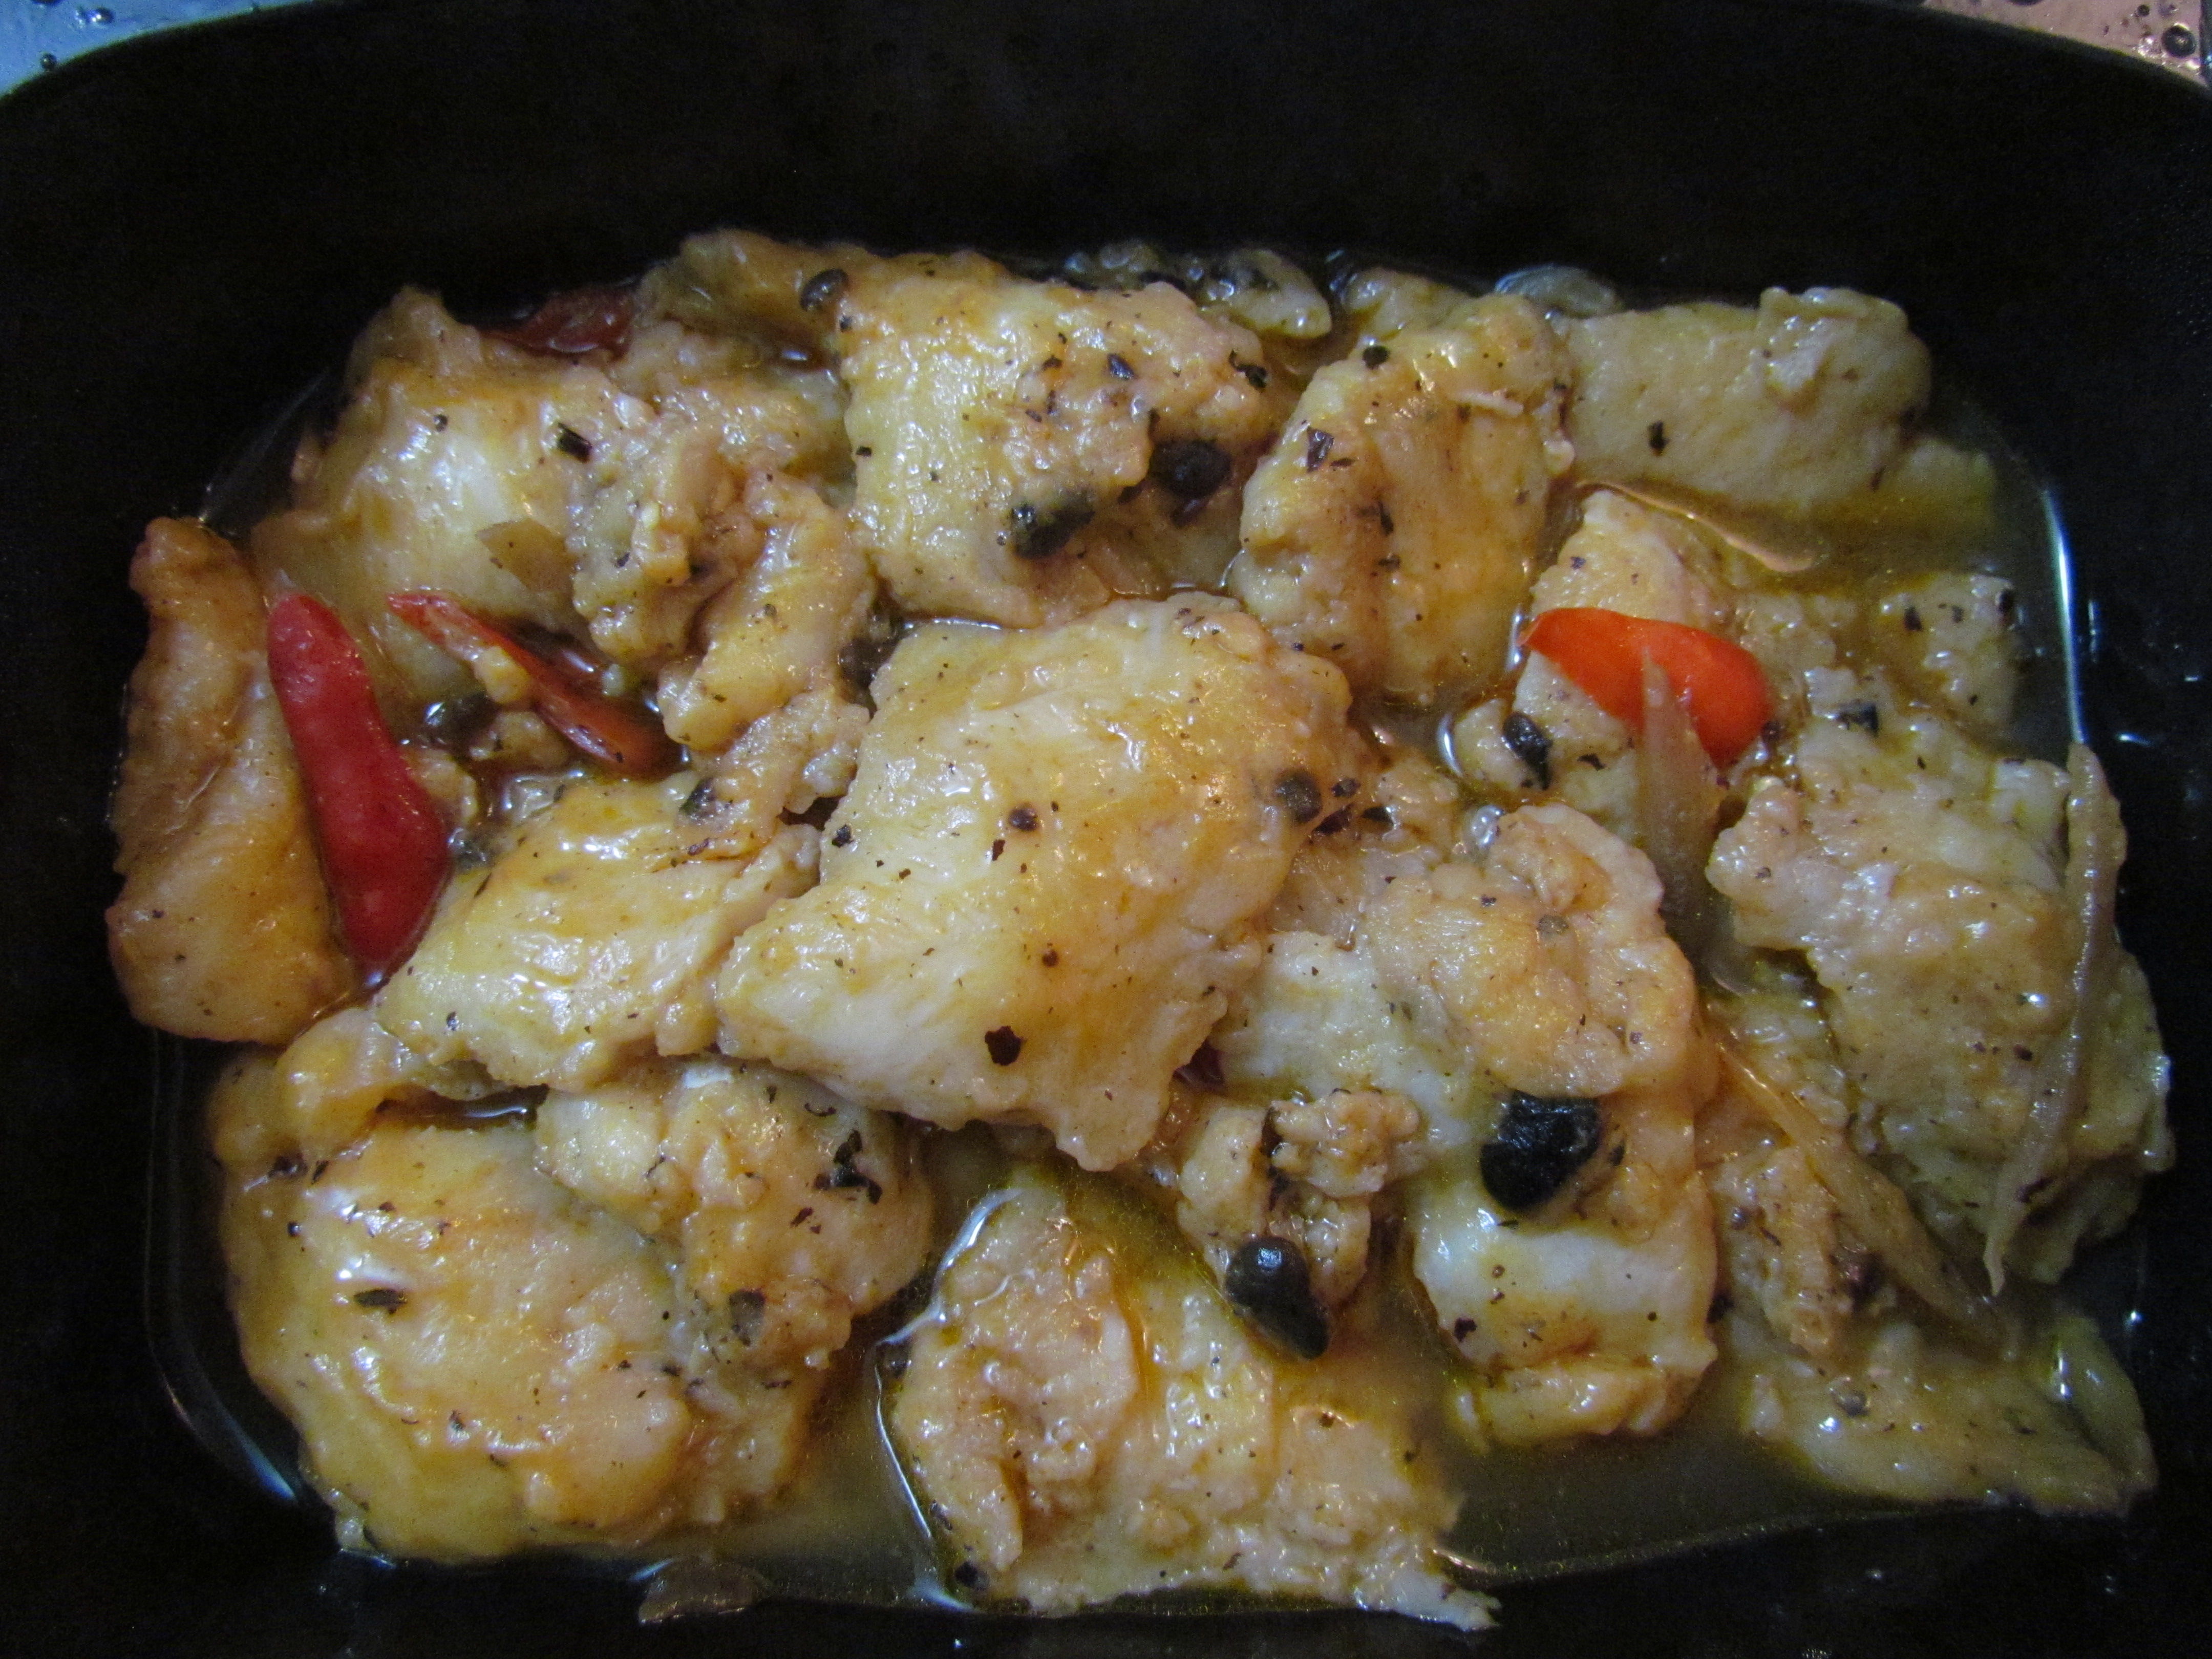 Big wong sf 55 dlf galleria dlf phase 4 gurgaon yummraj for Fish in black bean sauce